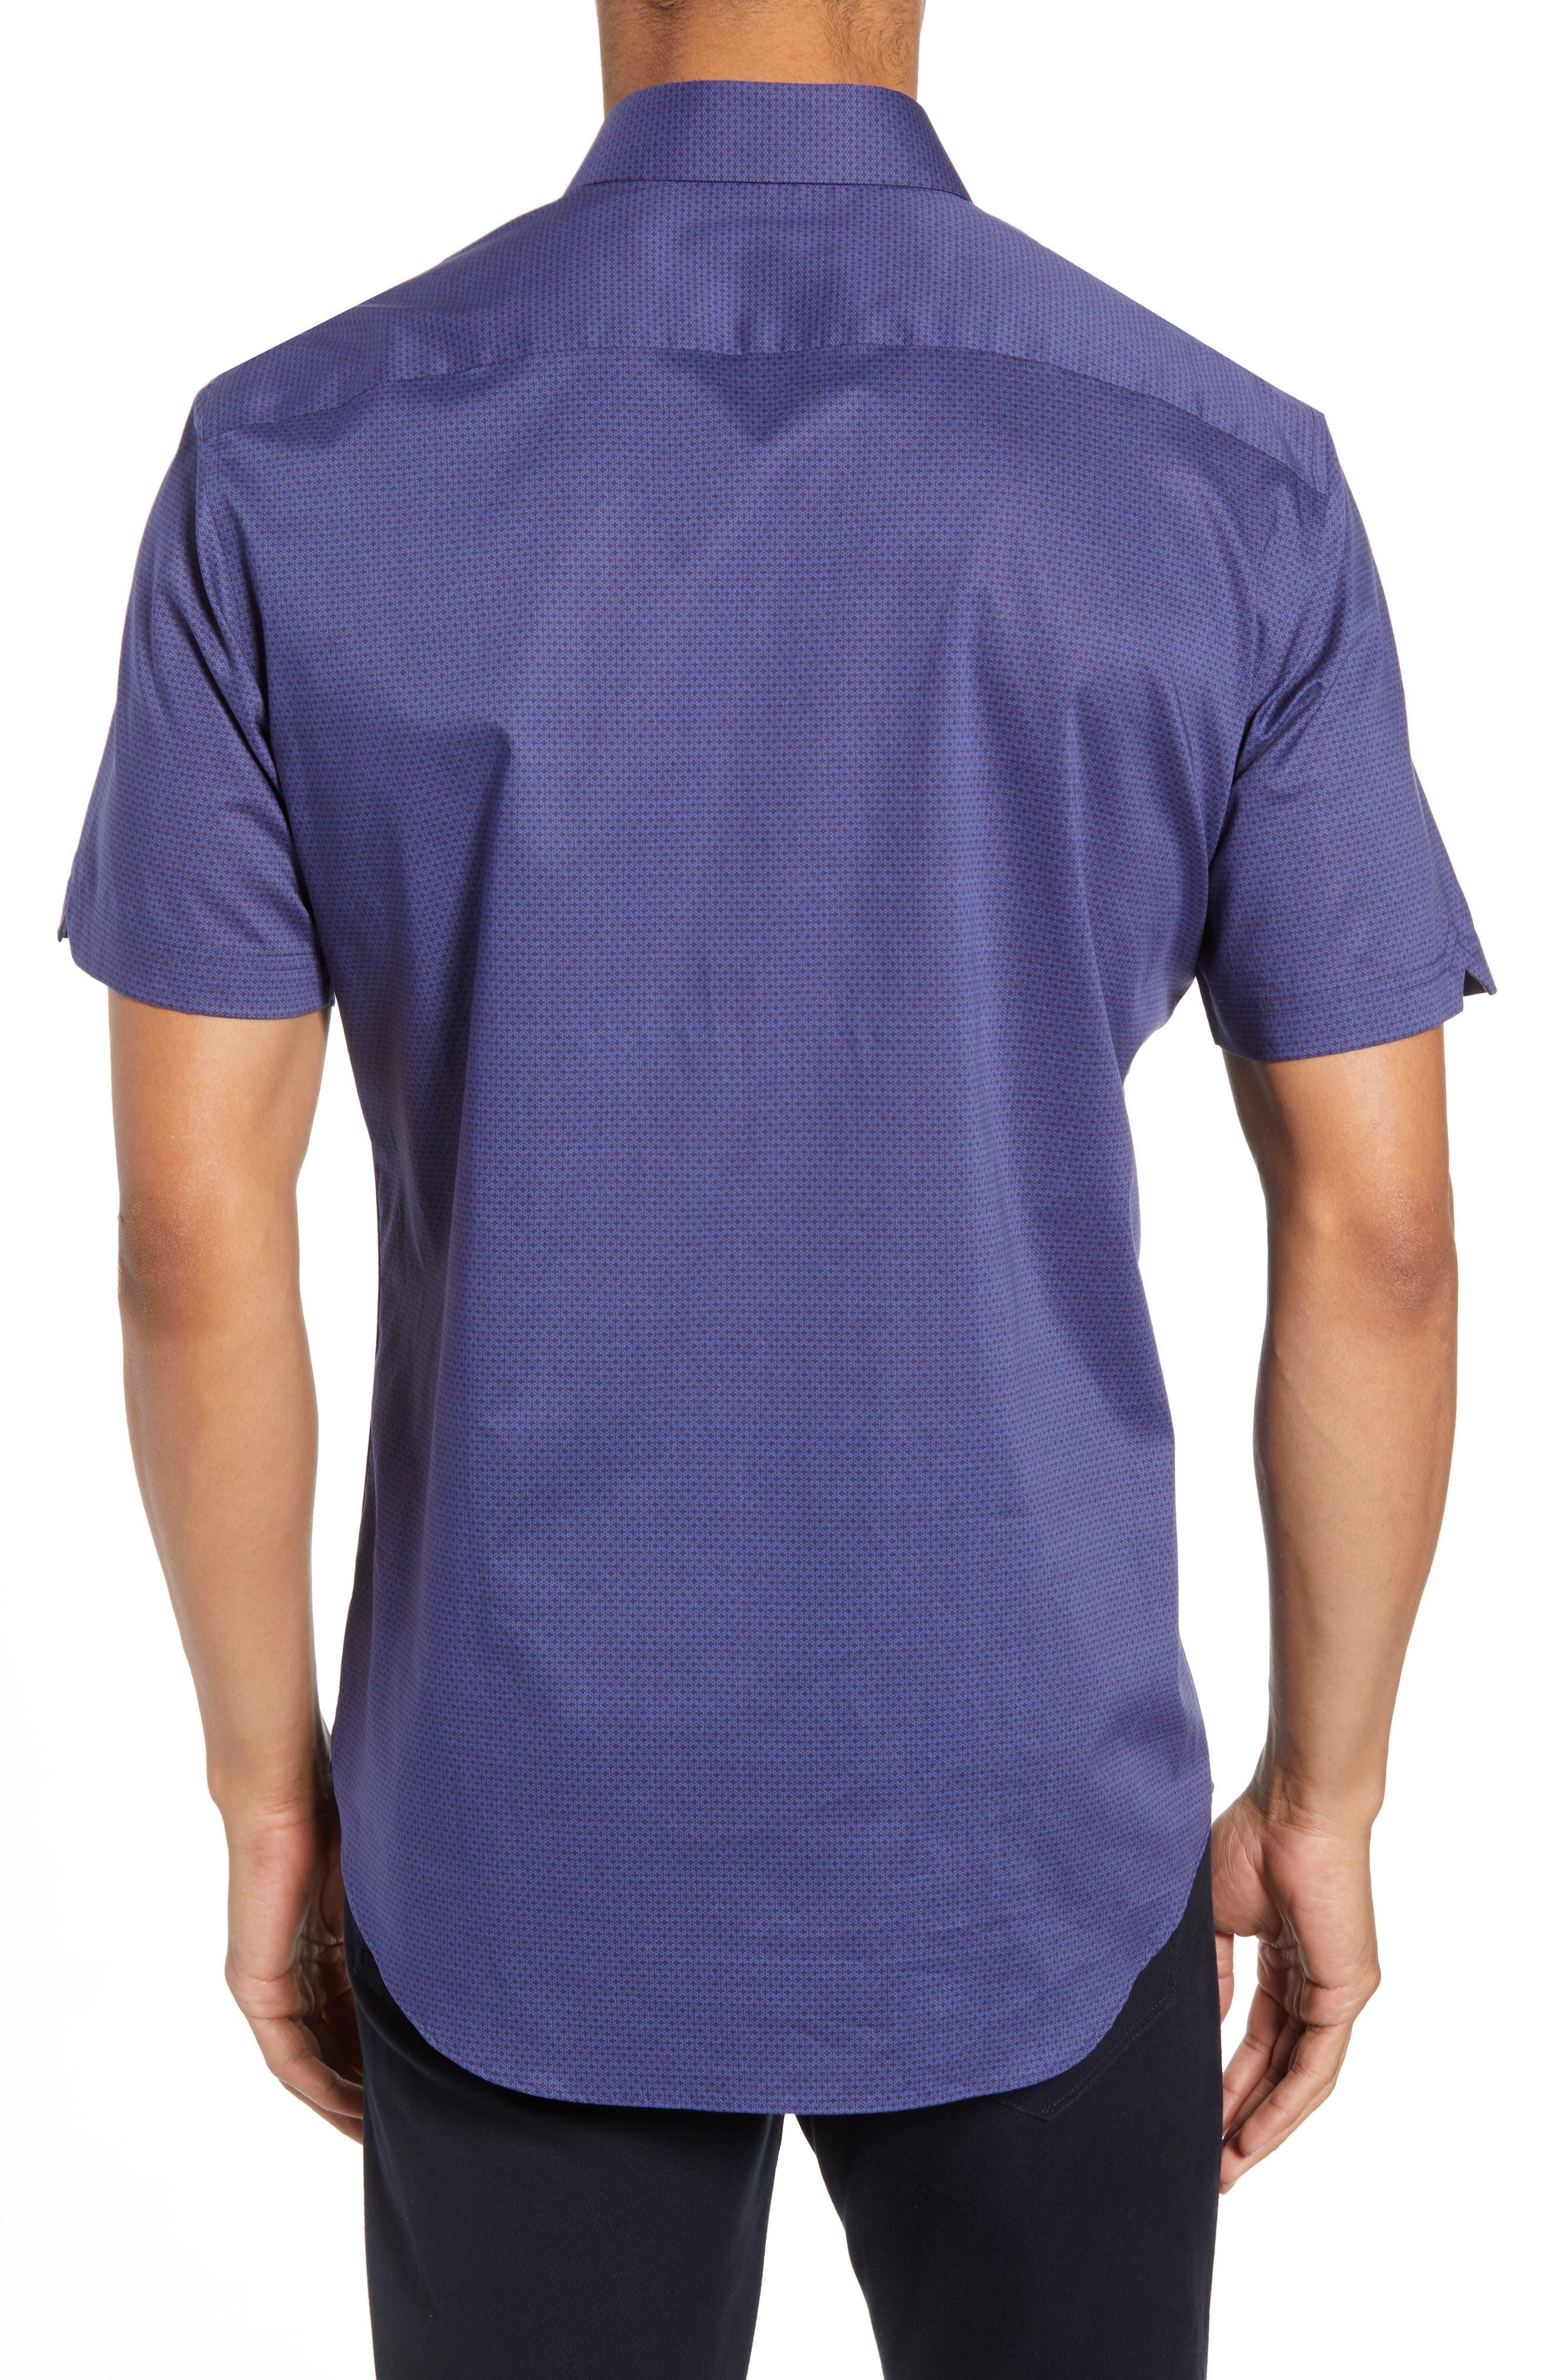 Avellan Regular Fit Sport Shirt,                             Alternate thumbnail 2, color,                             BLUE